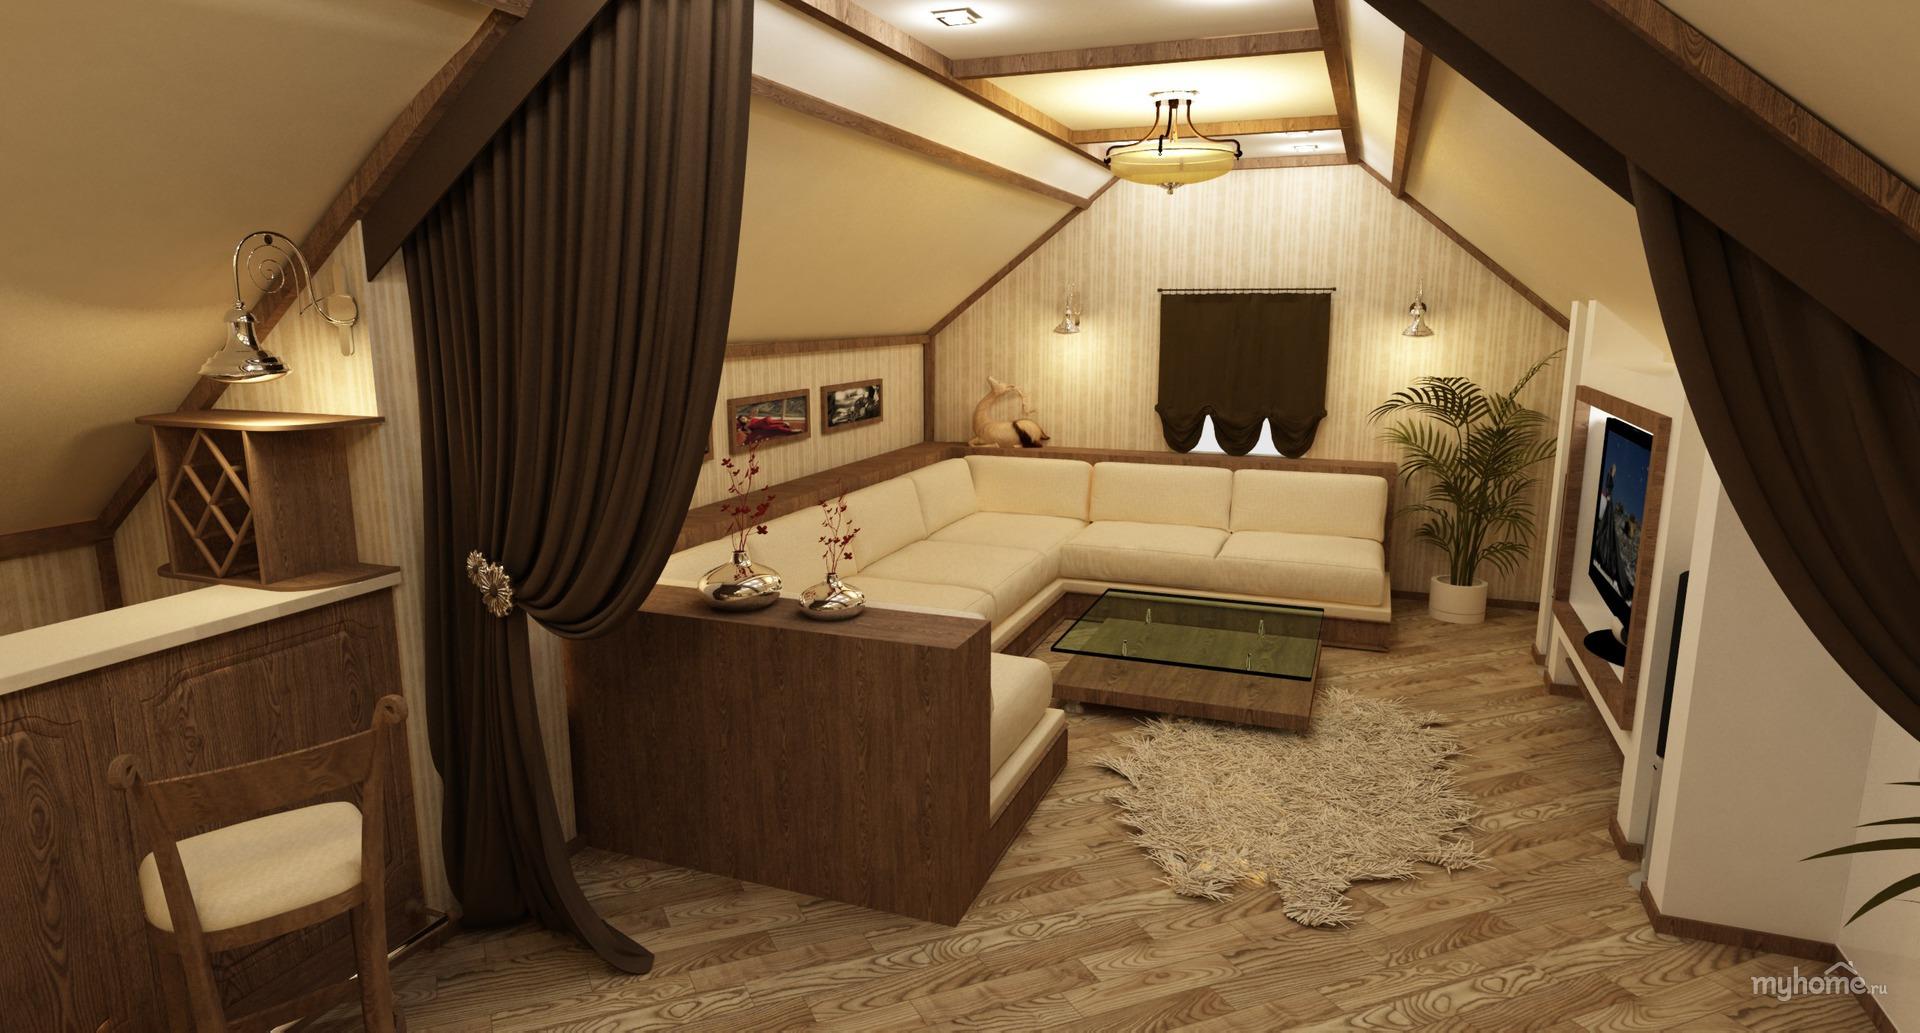 фото дизайн комнаты мансардного этажа дома